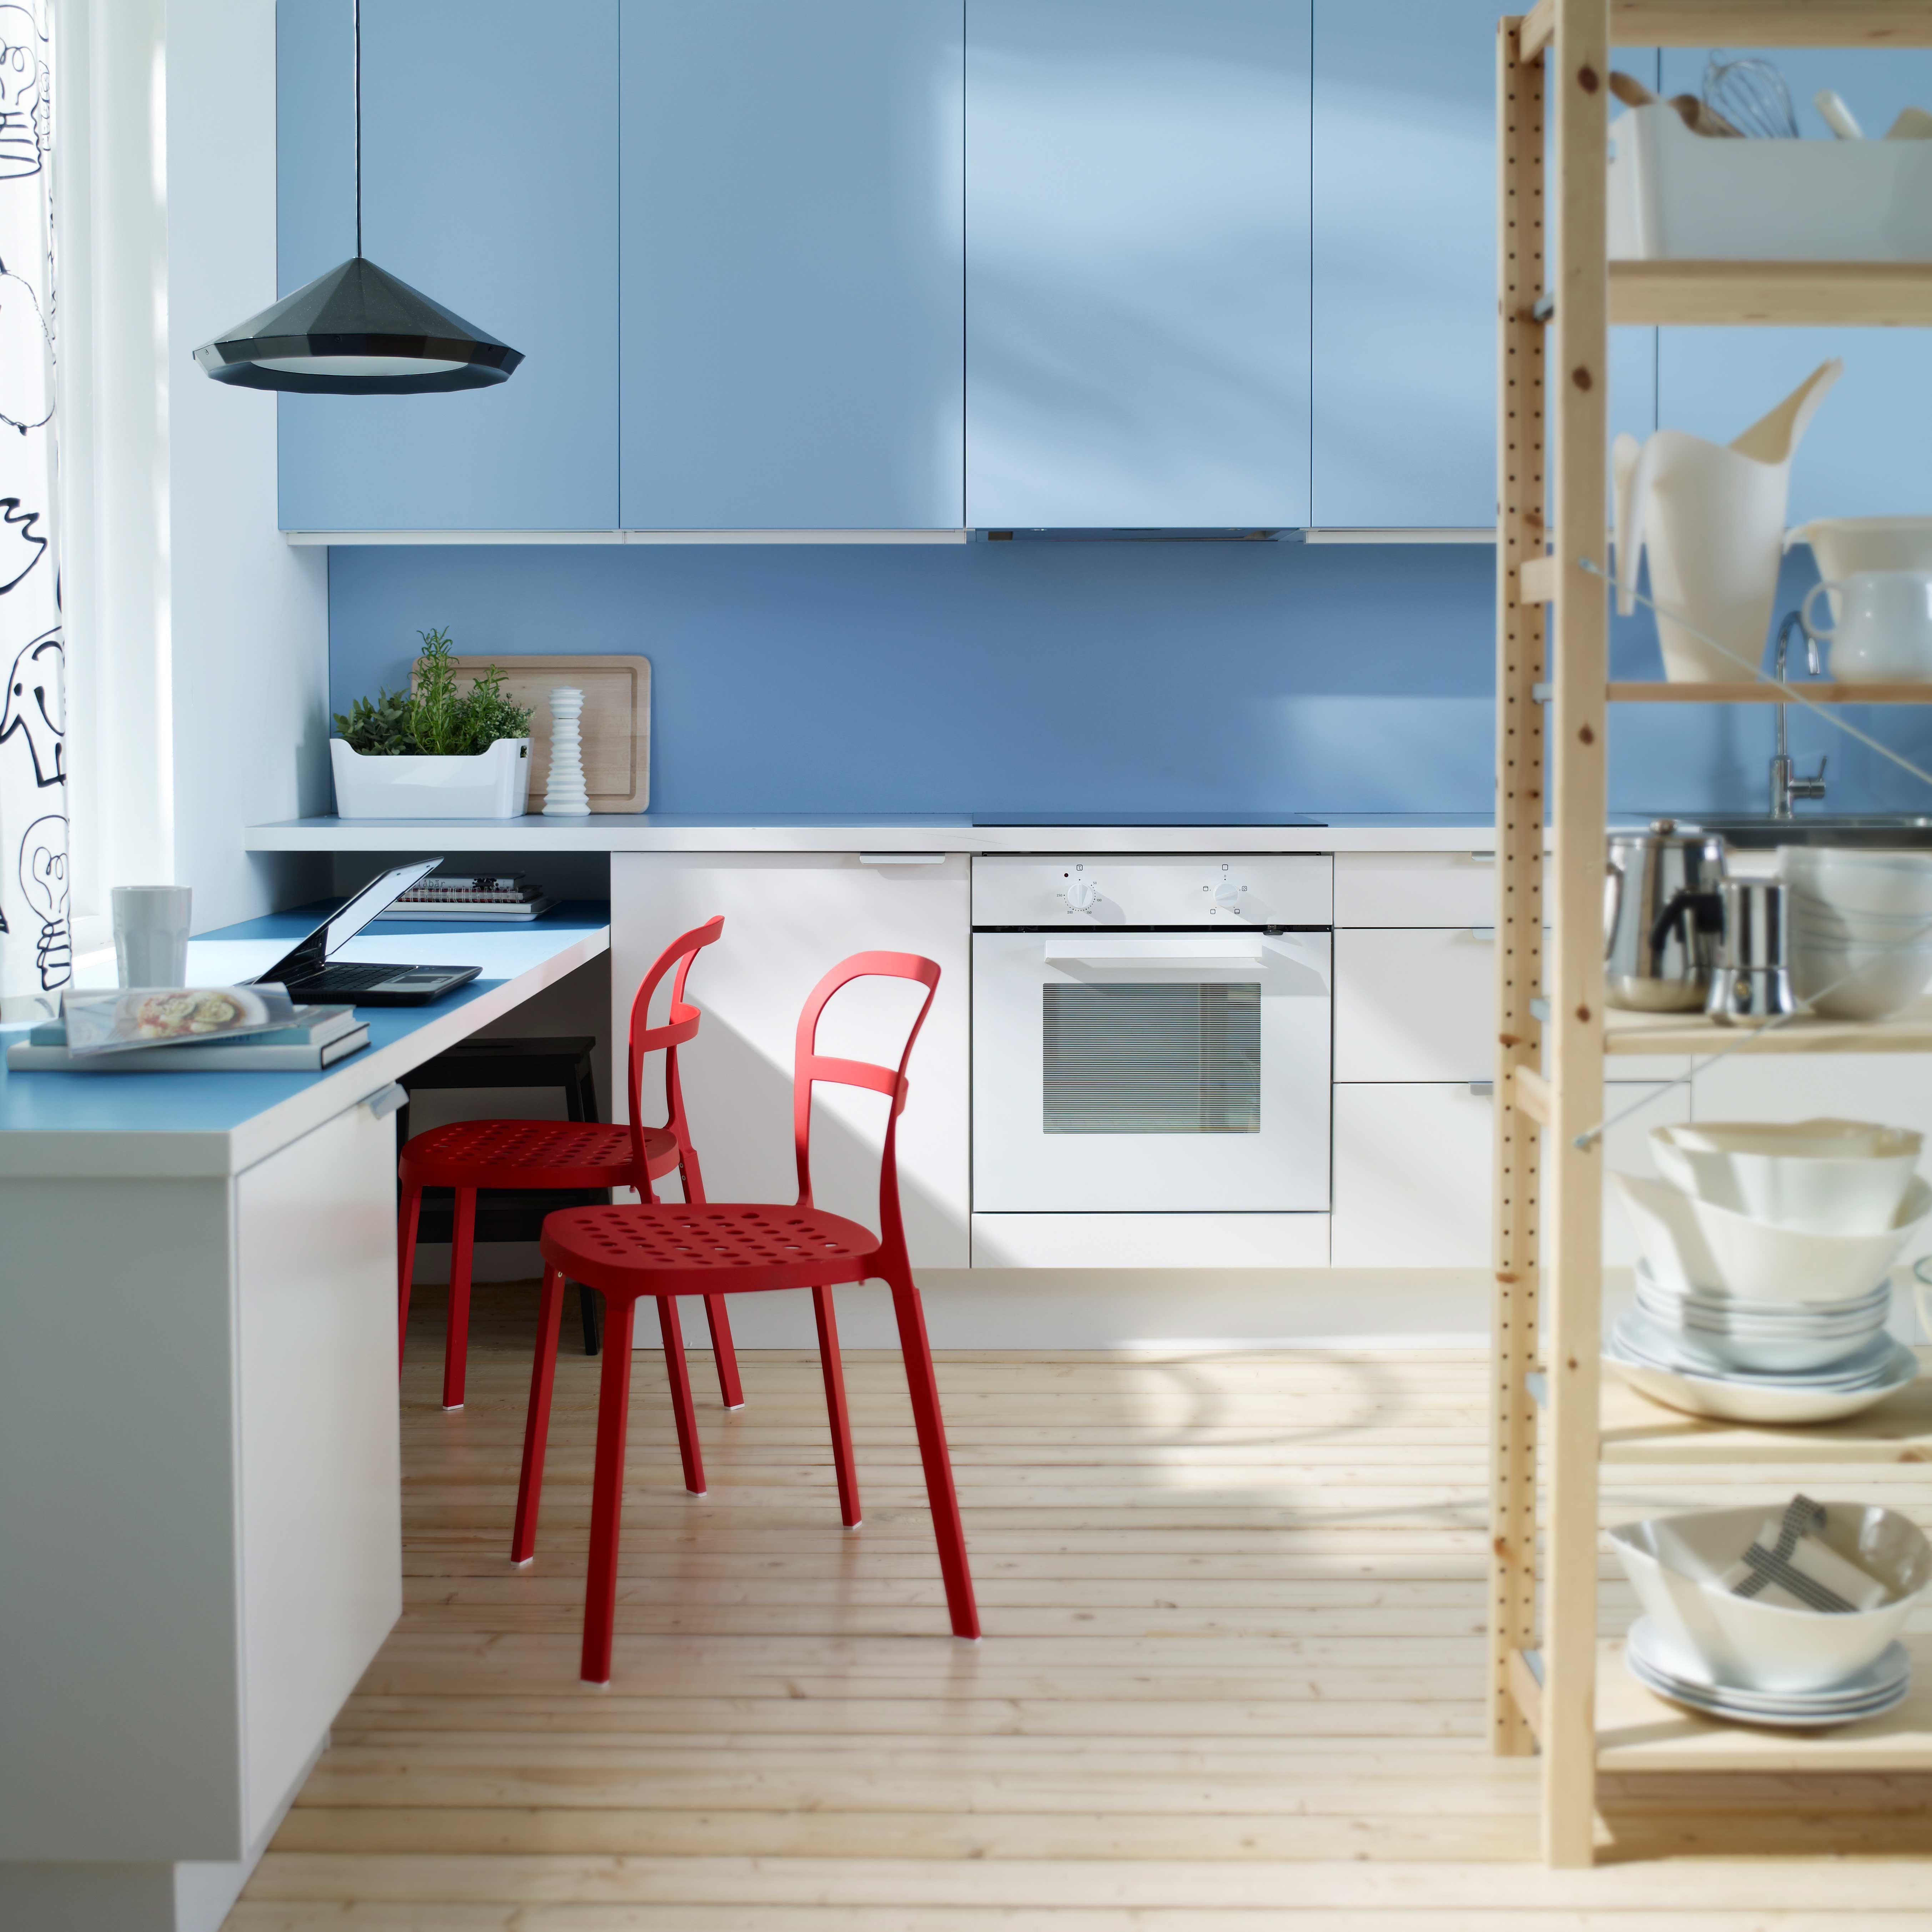 ikea sterreich inspiration k che blau t r rubrik. Black Bedroom Furniture Sets. Home Design Ideas